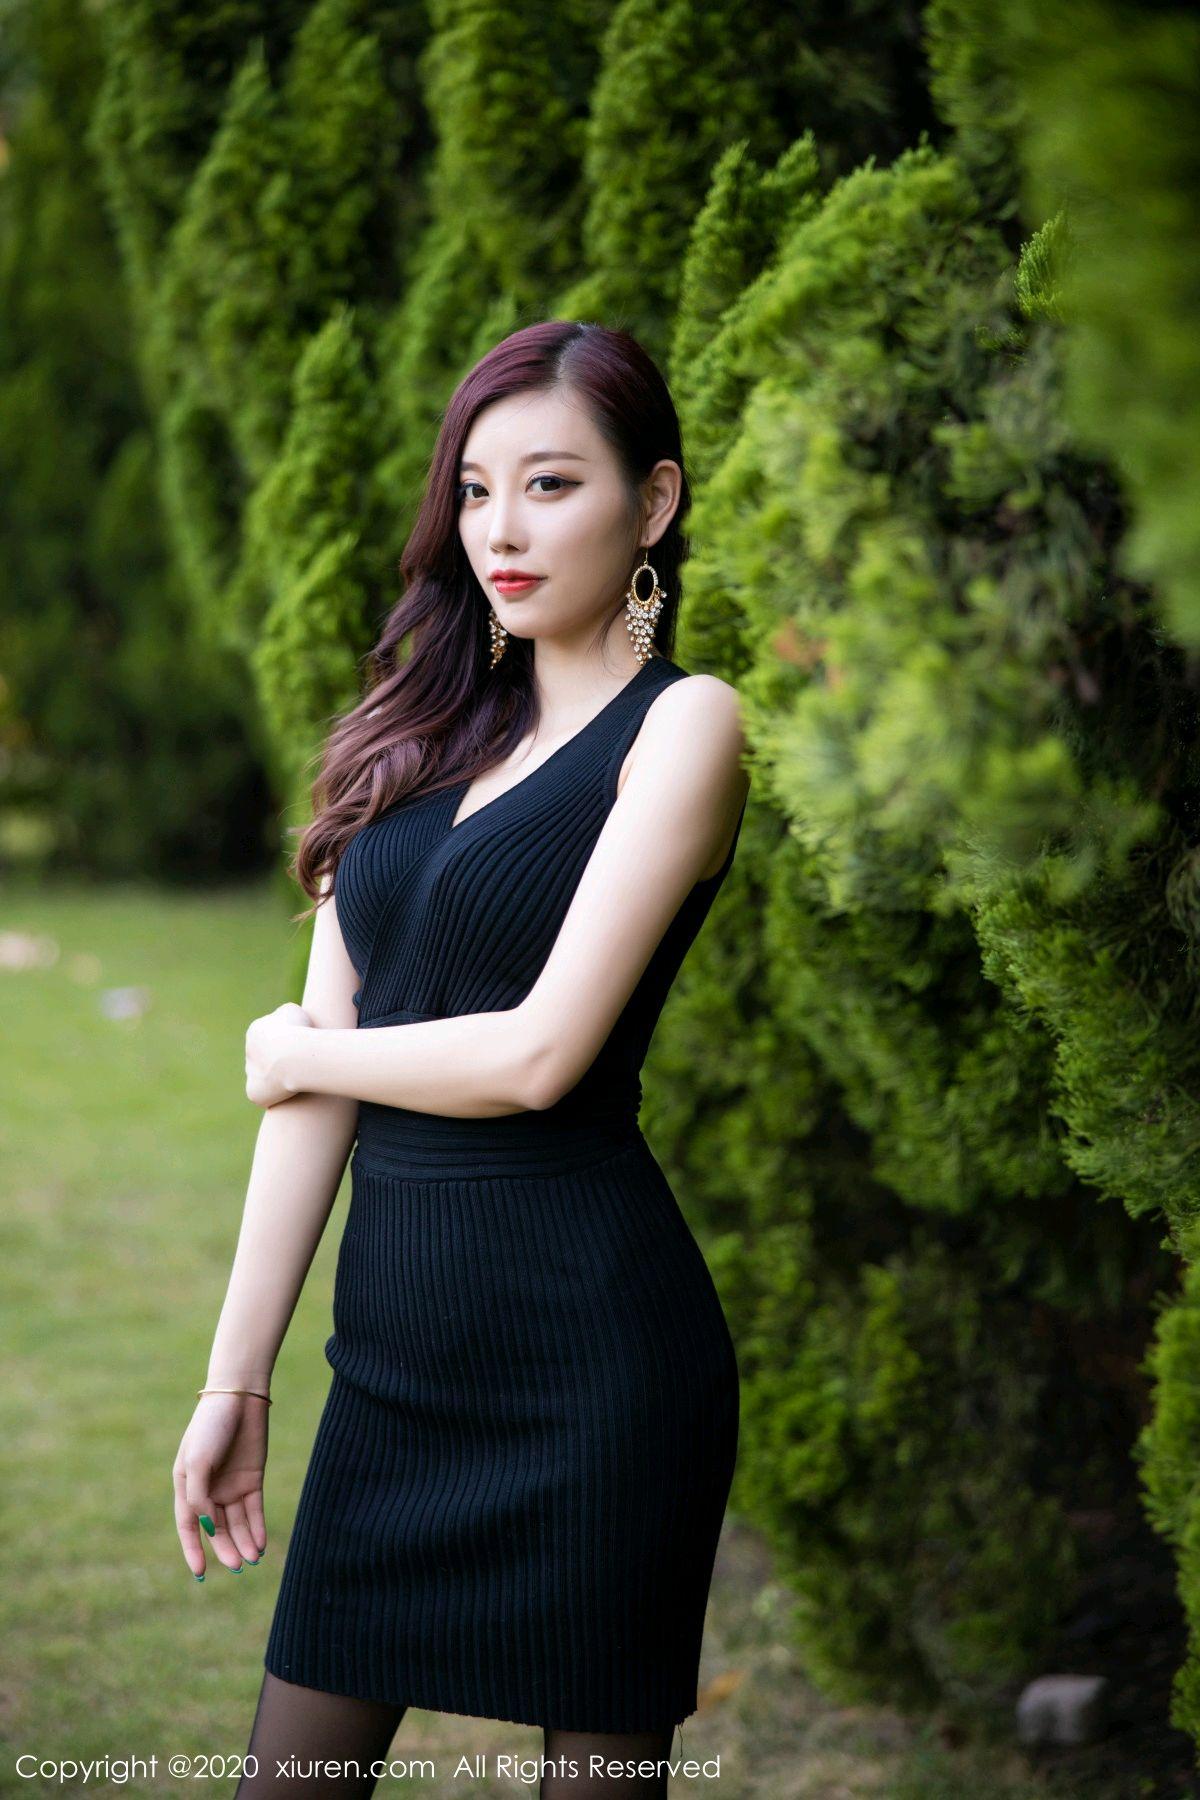 [XiuRen] Vol.2648 Yang Chen Chen 41P, Black Silk, Outdoor, Xiuren, Yang Chen Chen